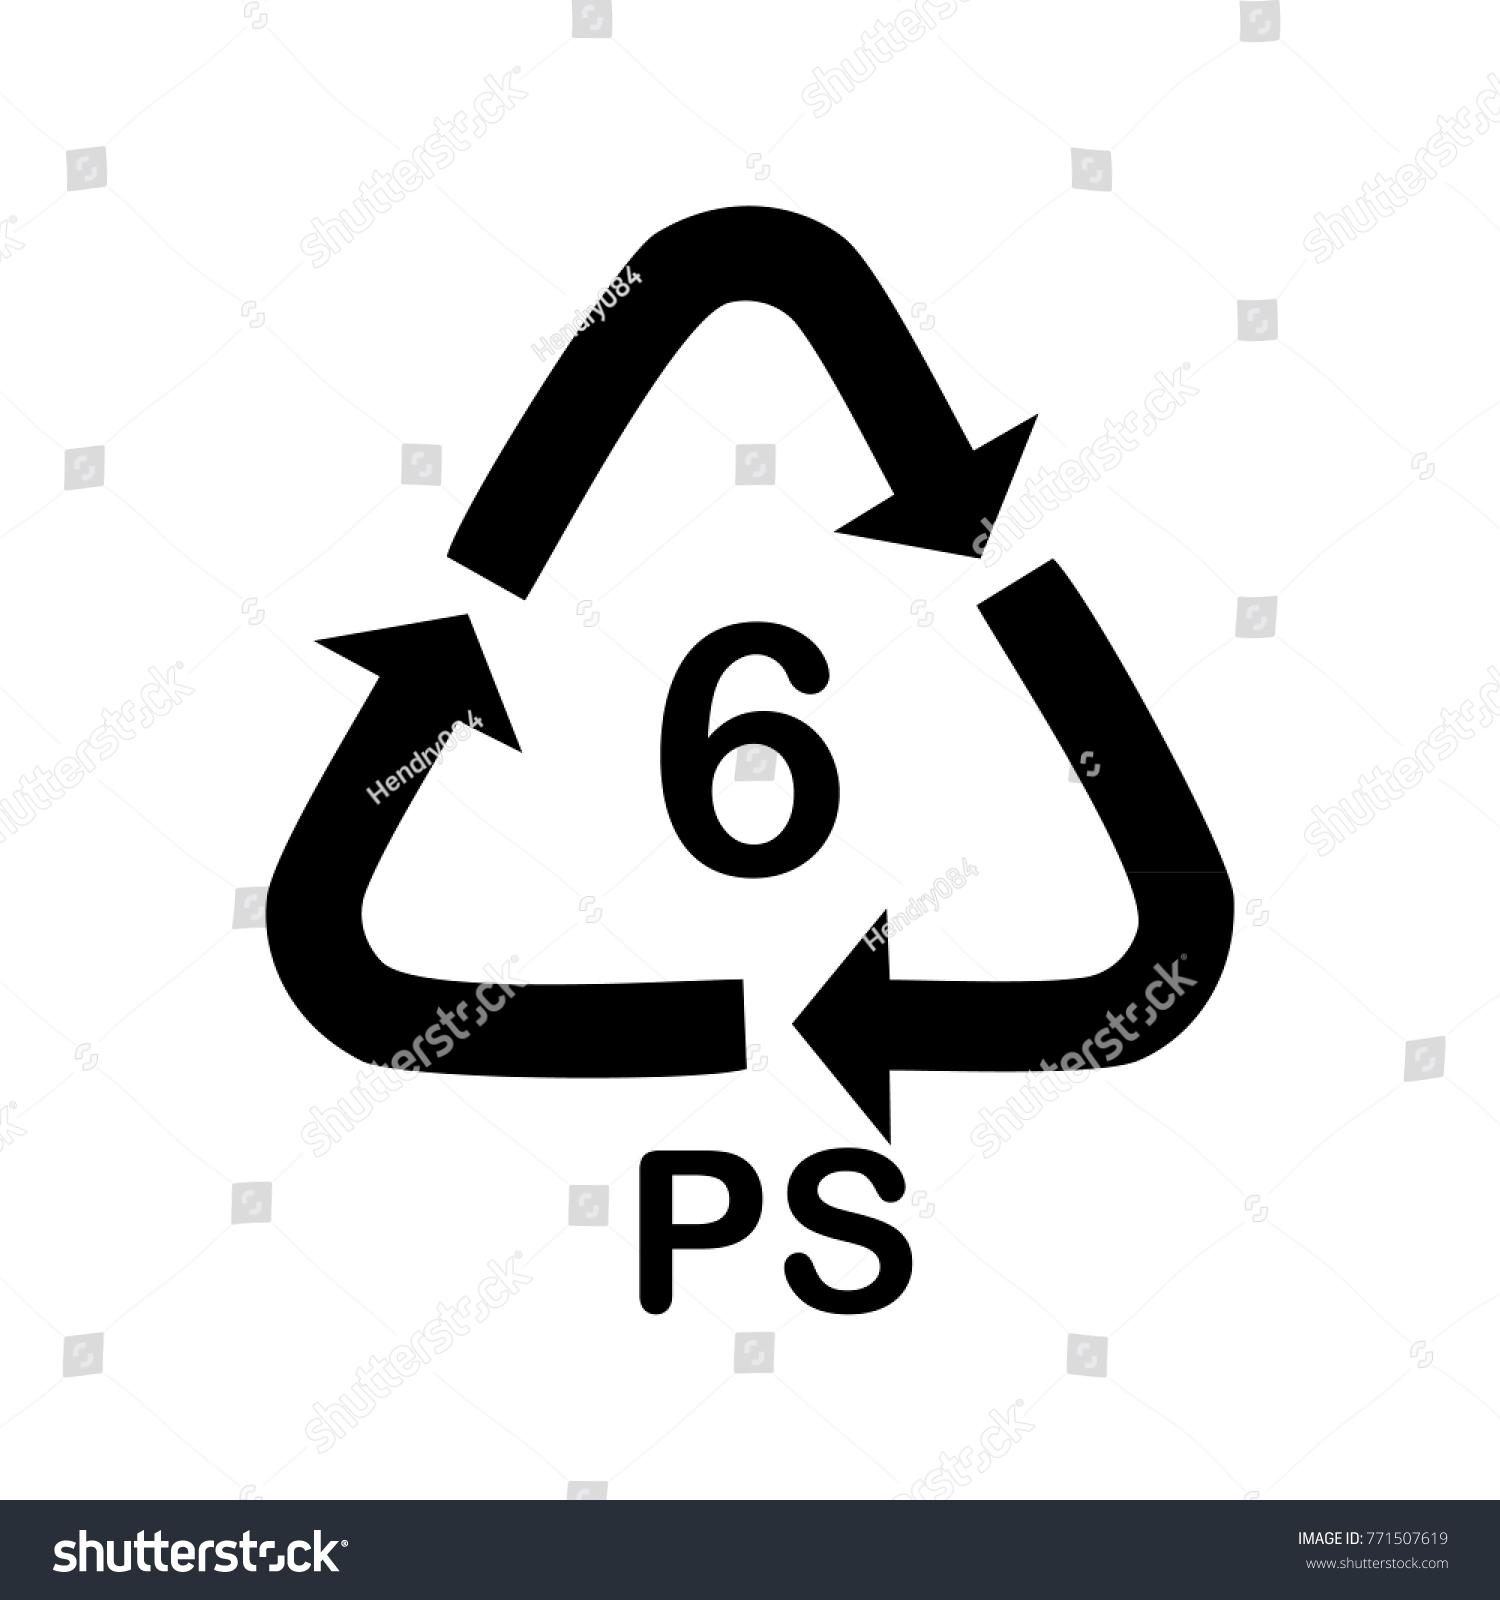 Playstation stock symbol image collections symbol and sign ideas playstation stock symbol gallery symbol and sign ideas plastic recycle symbol ps 6 icon stock vector buycottarizona